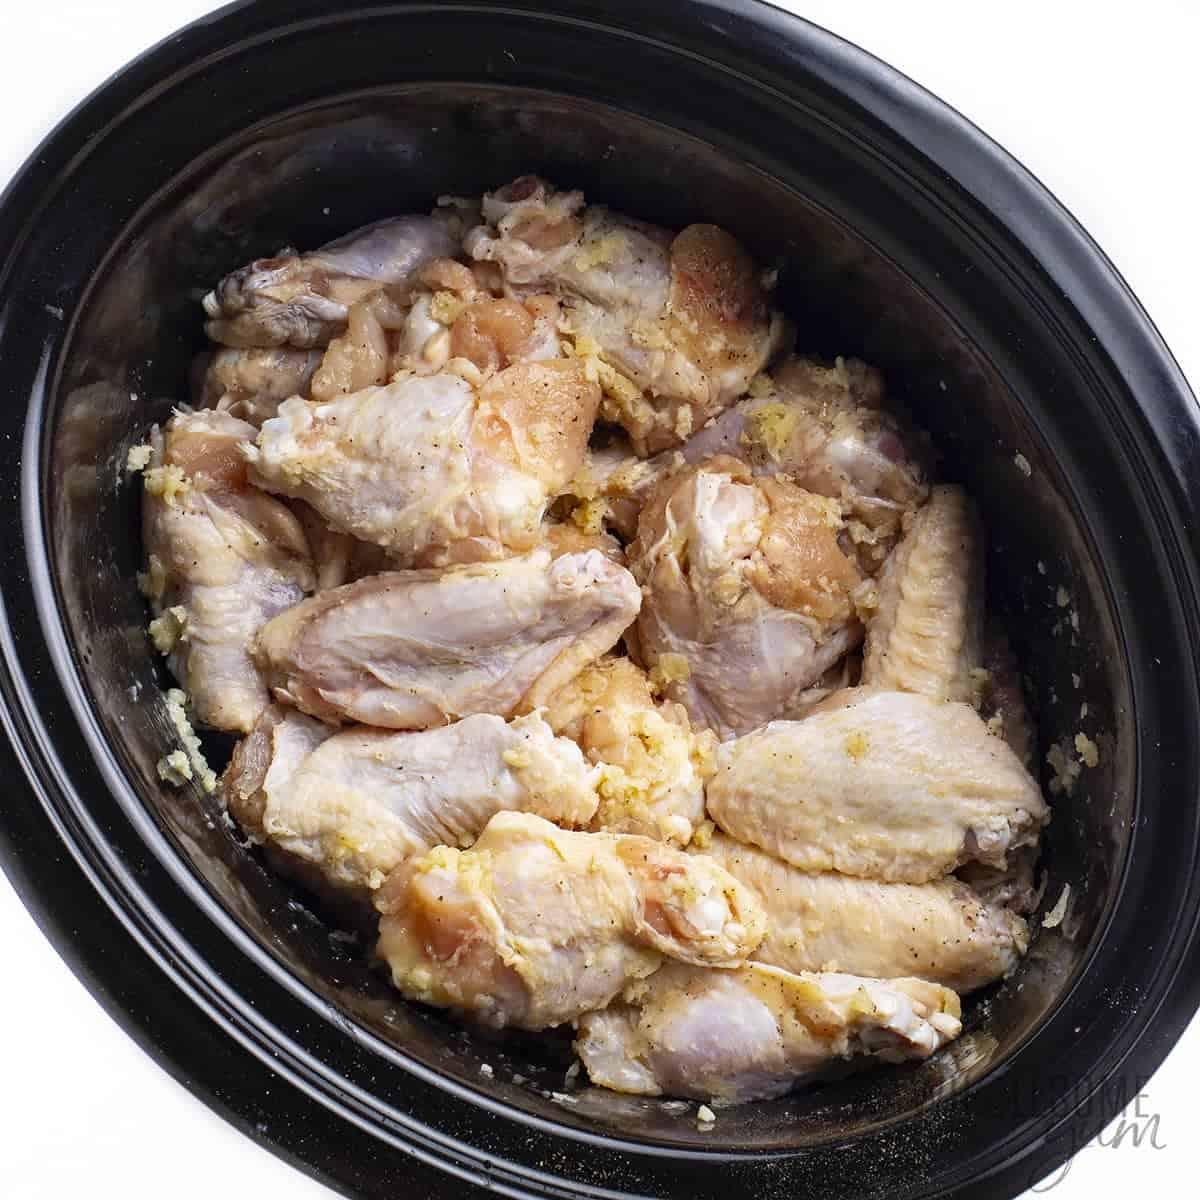 Garlic parmesan chicken wings in slow cooker